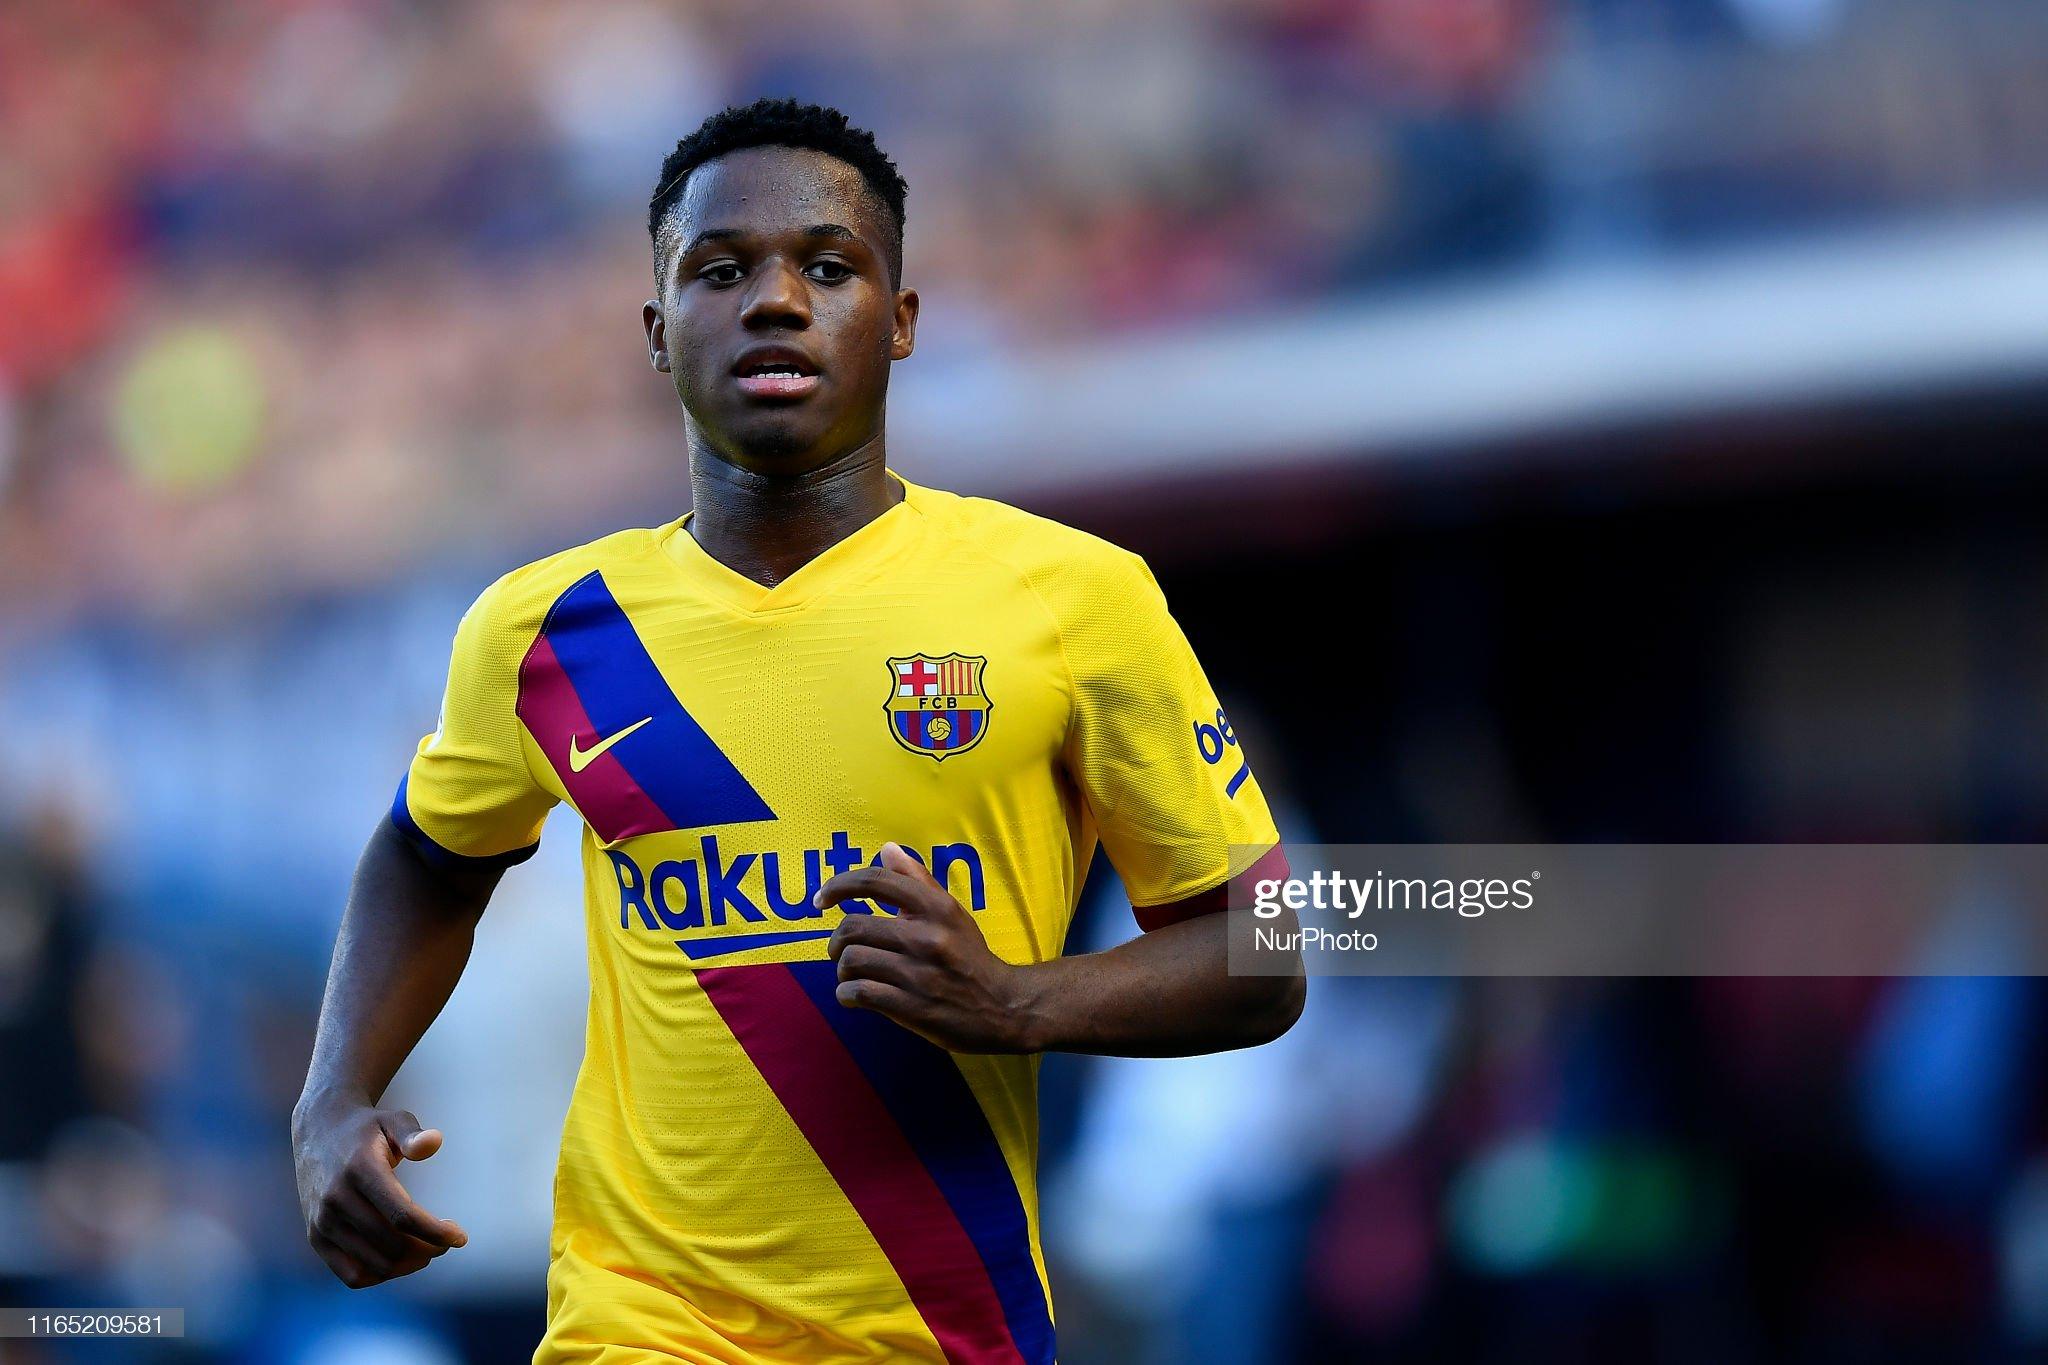 صور مباراة : أوساسونا - برشلونة 2-2 ( 31-08-2019 )  Ansu-fati-of-barcelona-in-action-during-the-liga-match-between-ca-picture-id1165209581?s=2048x2048